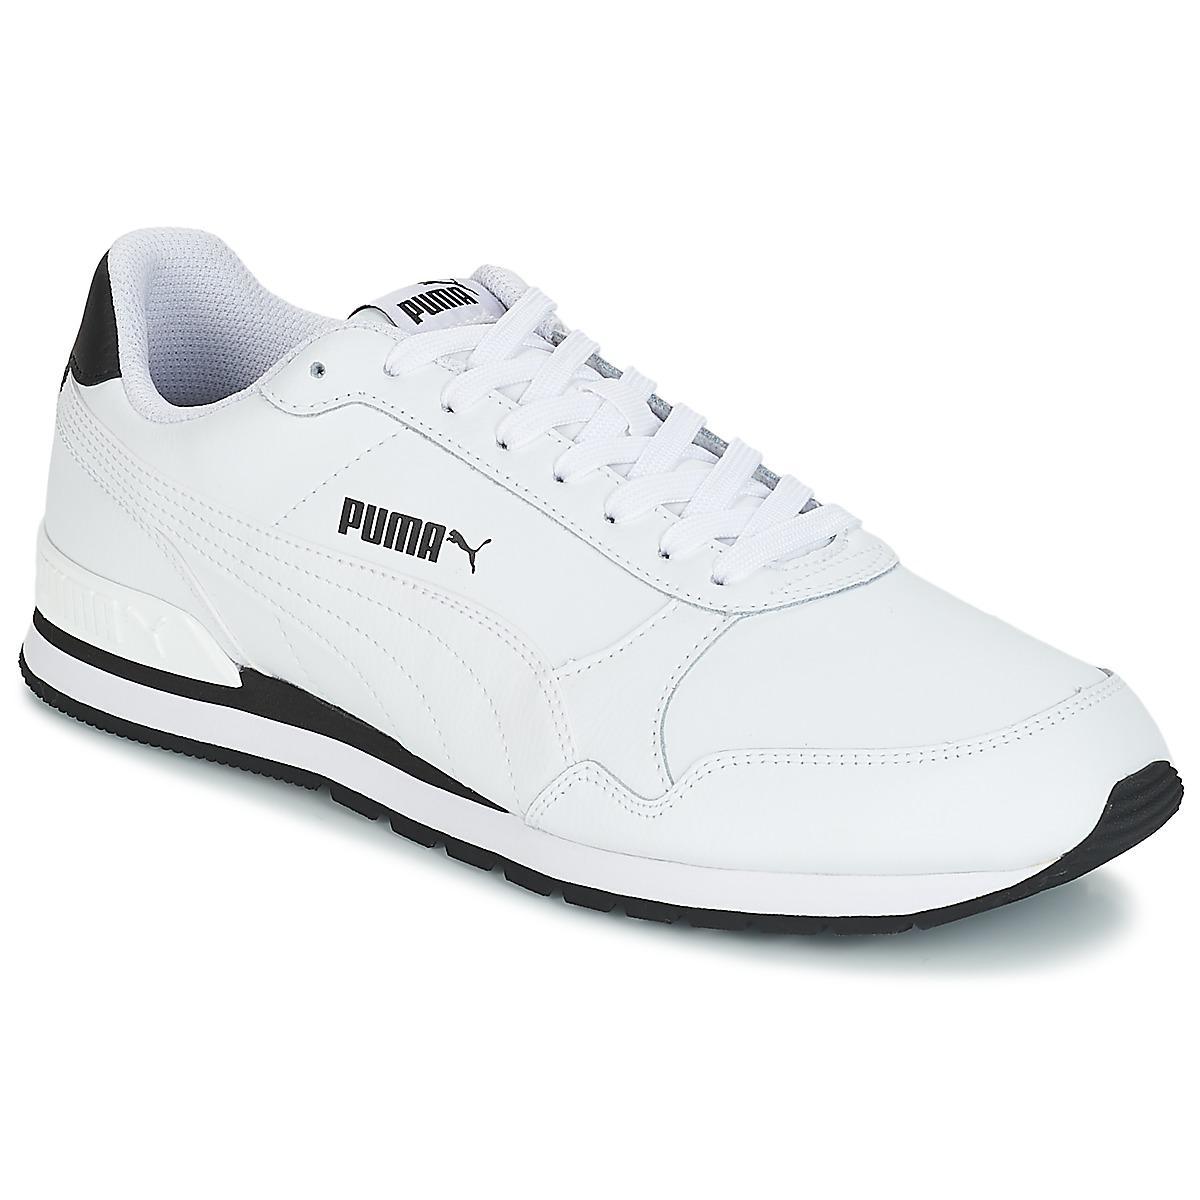 official photos ca481 bc3a9 Lyst - ST RUNNER V2 FUL.WHT hommes Chaussures en blanc PUMA pour ...